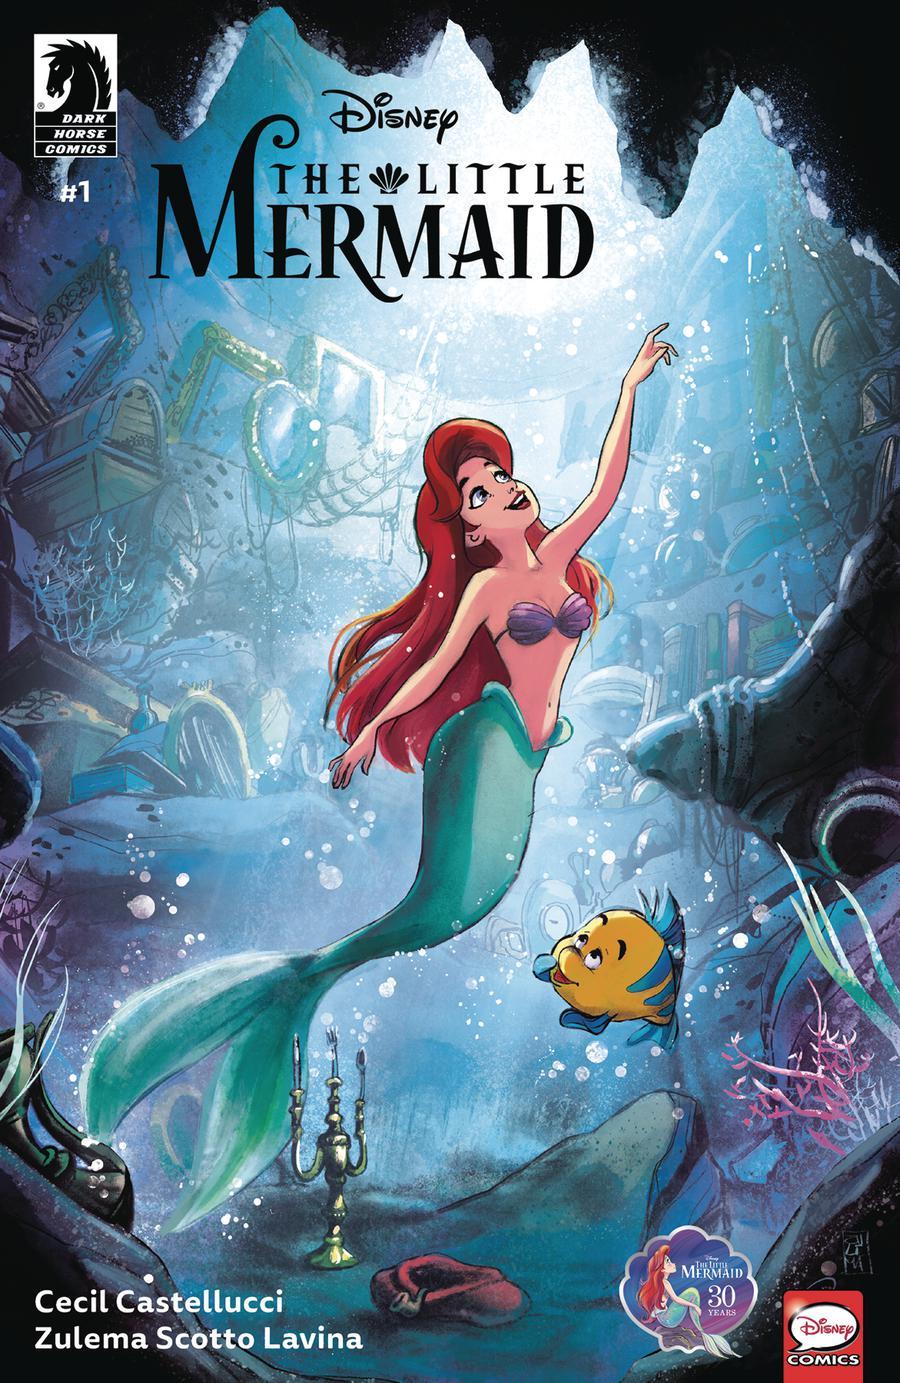 Disney The Little Mermaid (Dark Horse) #1